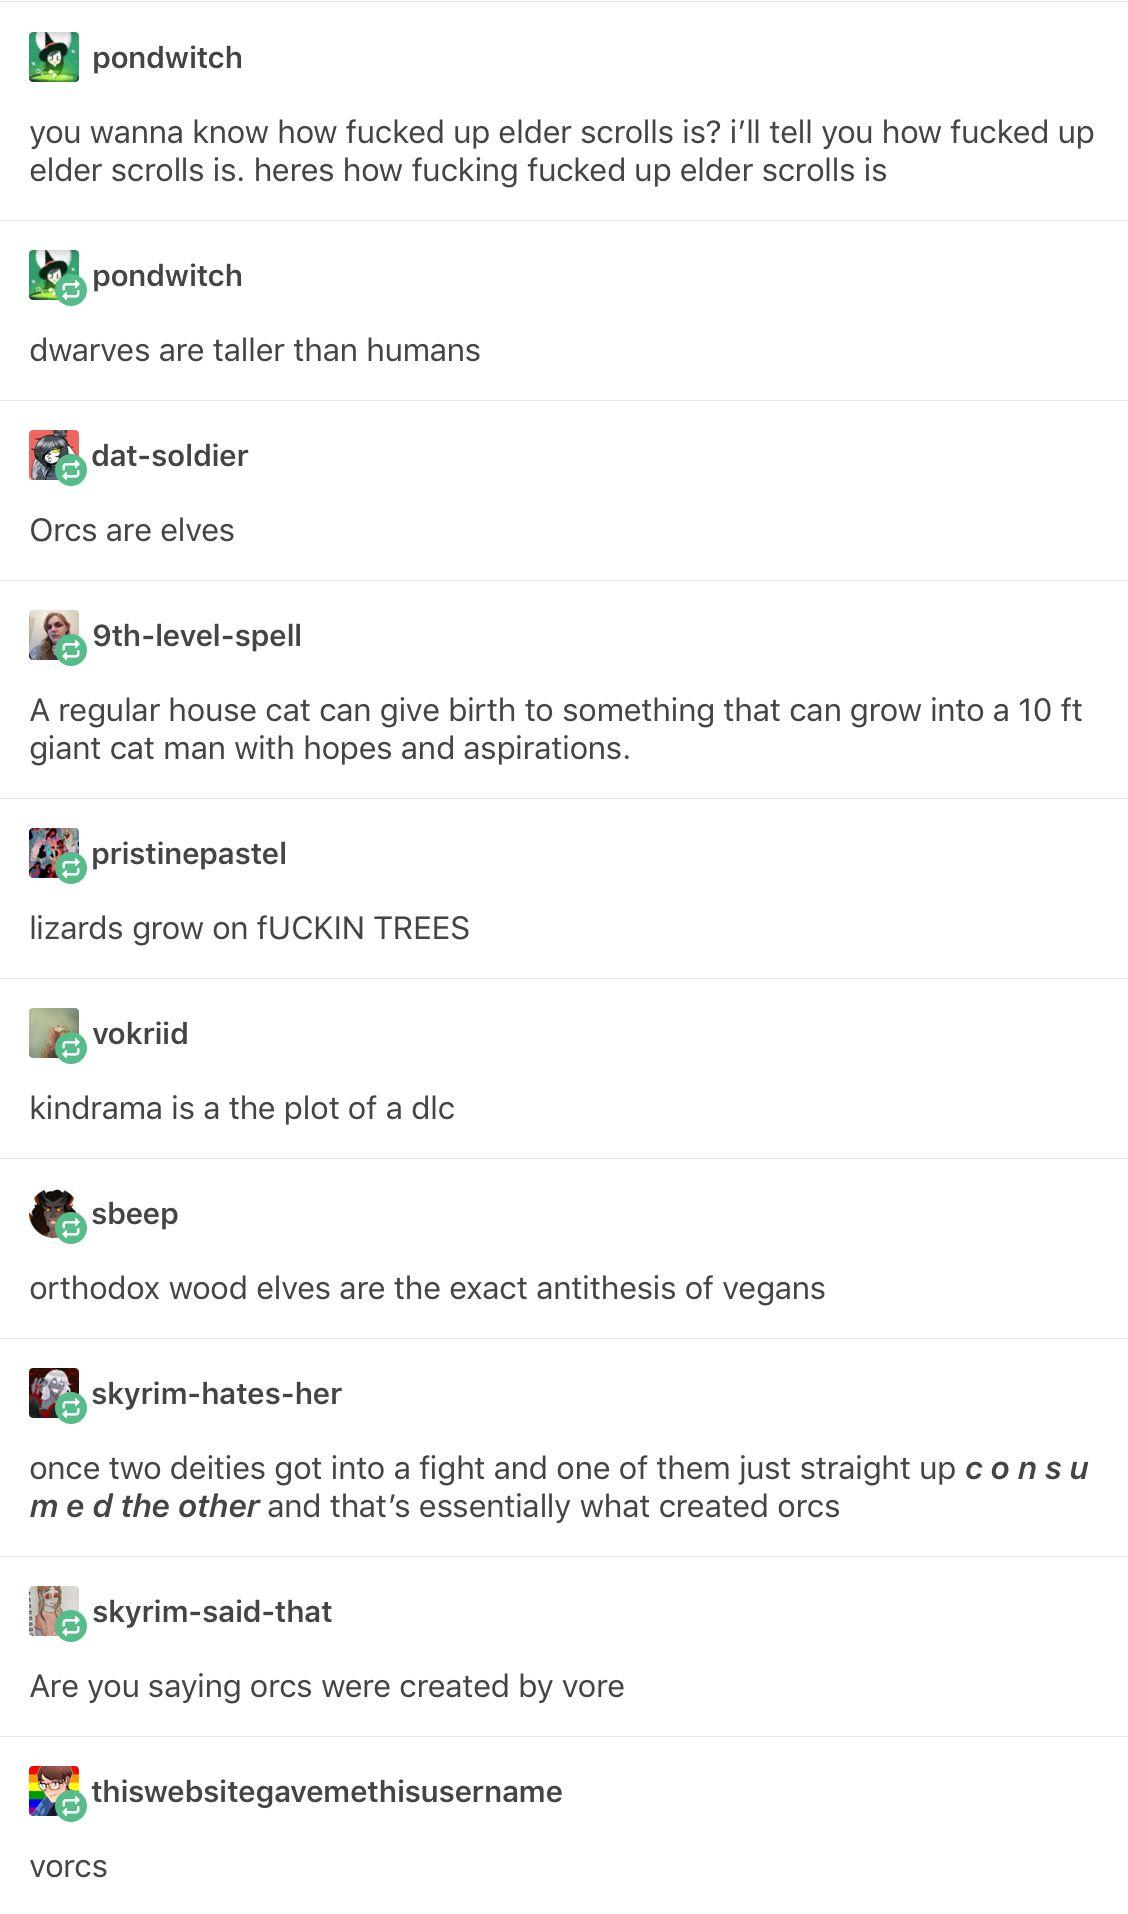 How fucked up is Elder Scrolls ESO